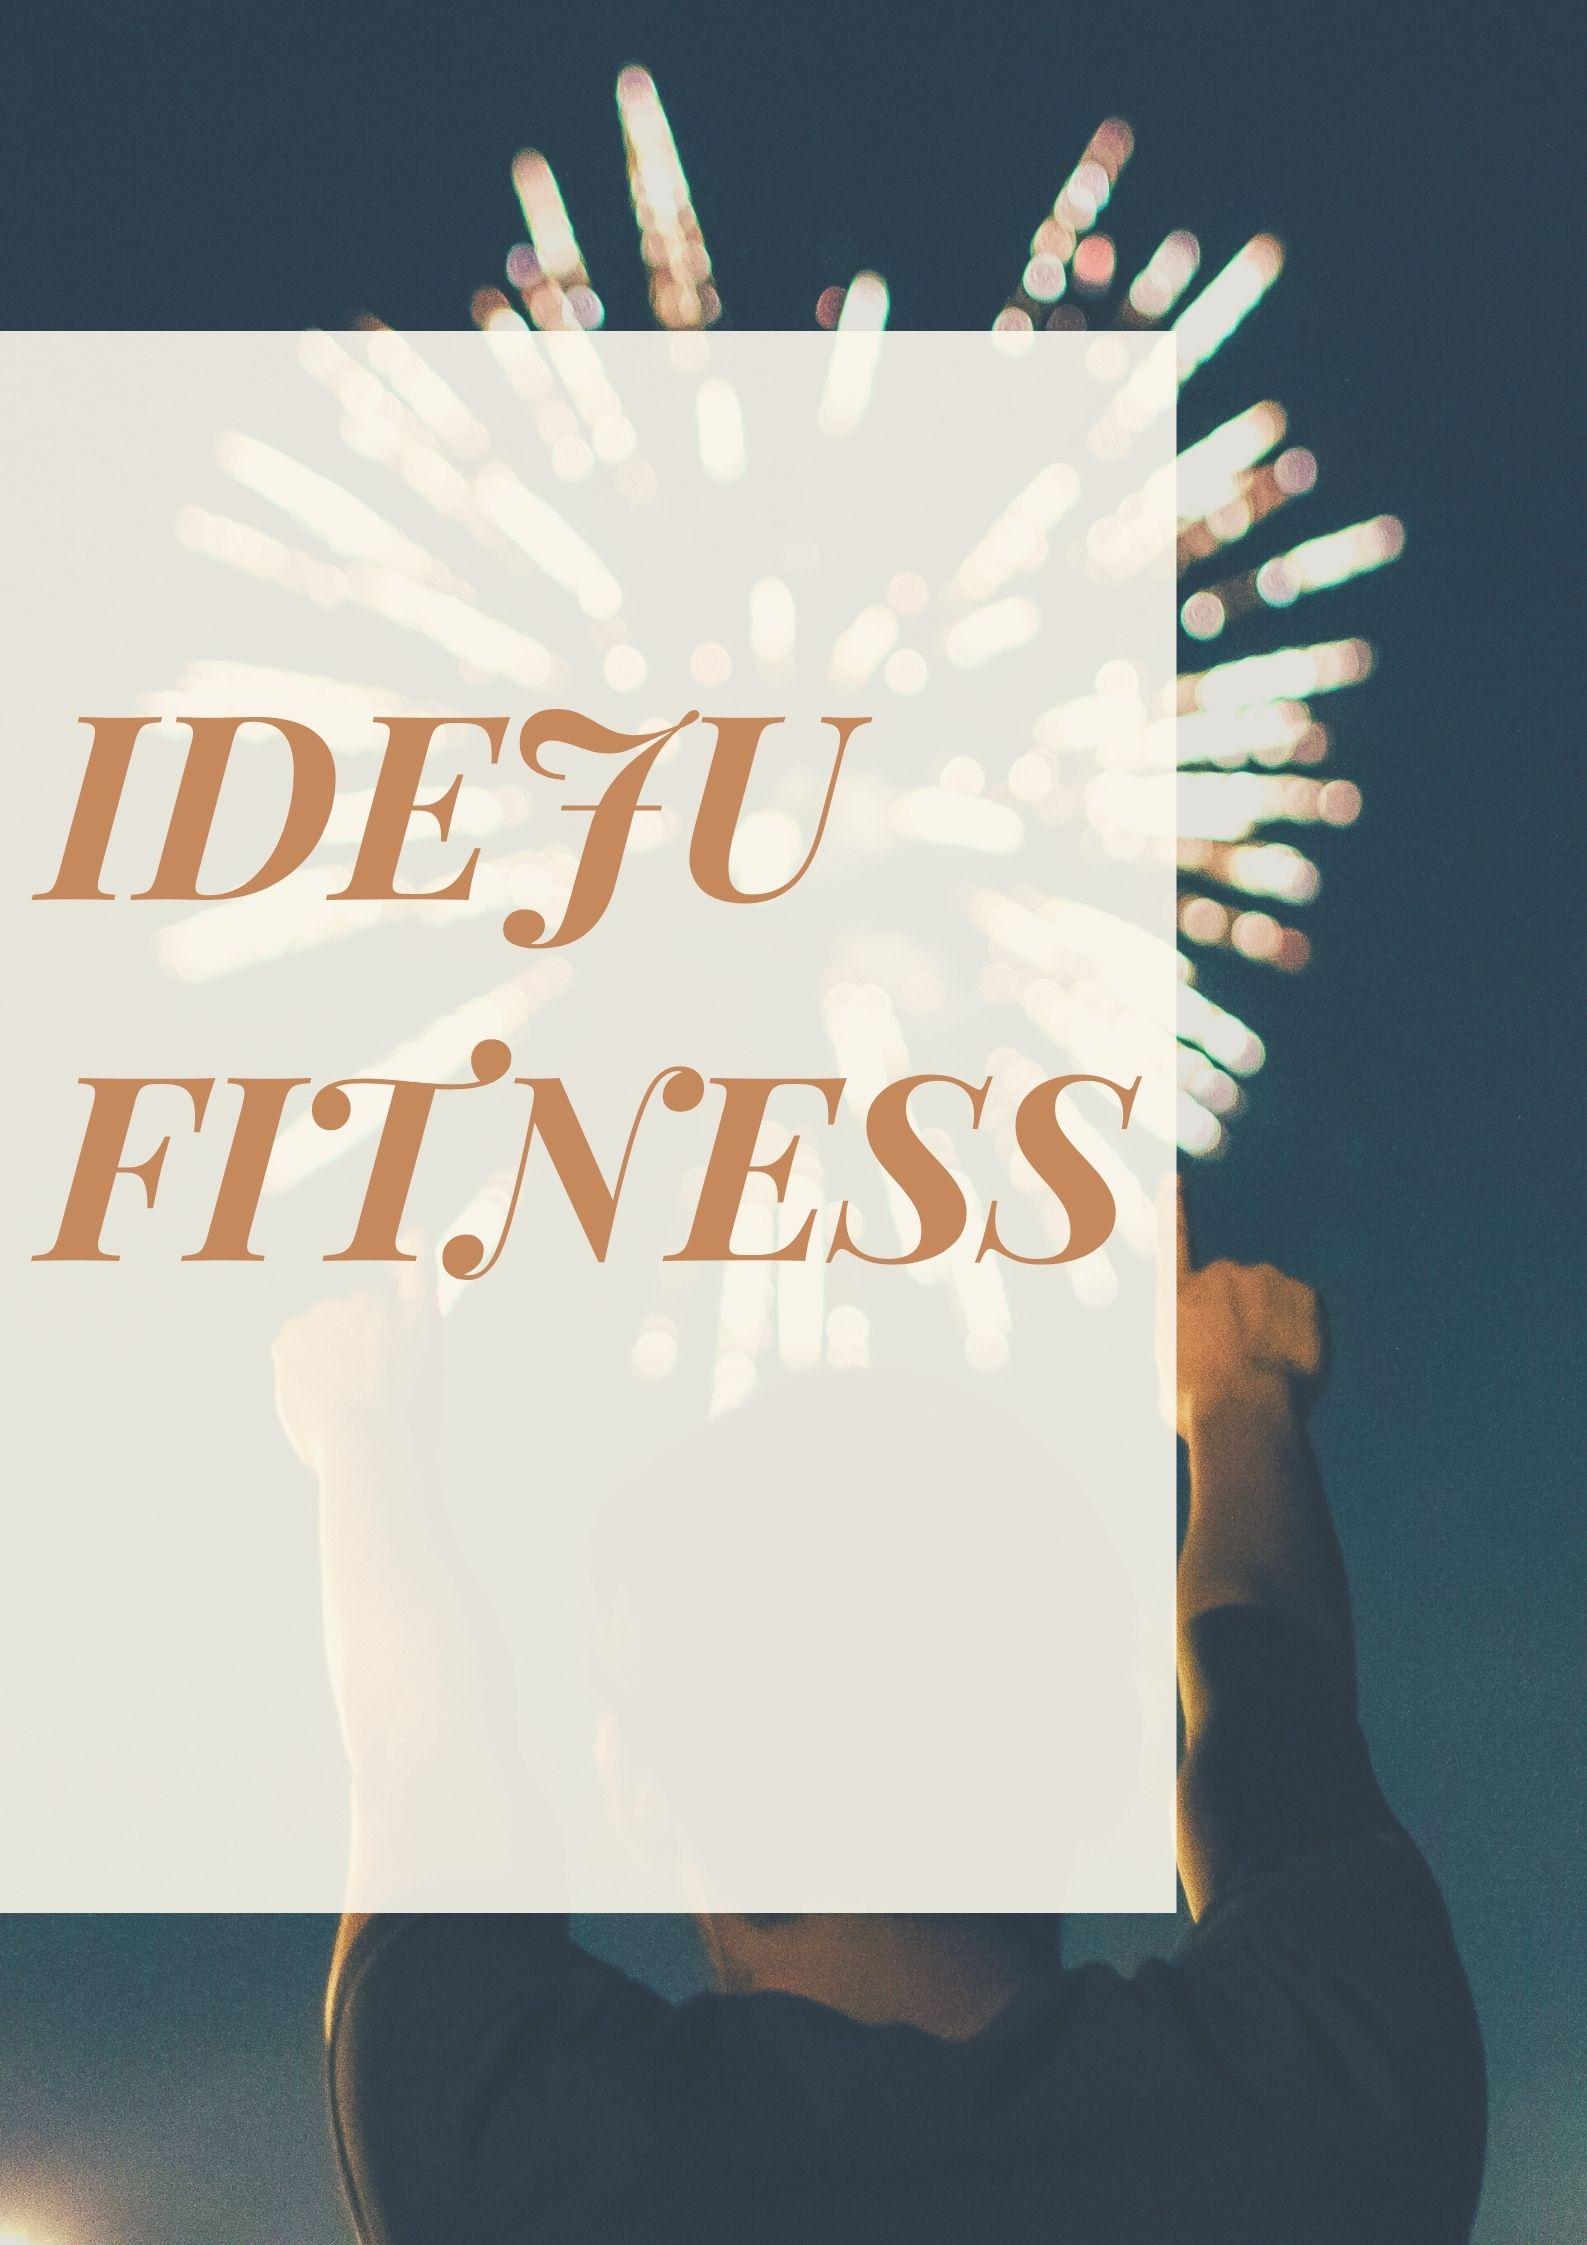 Ideju fitness?!